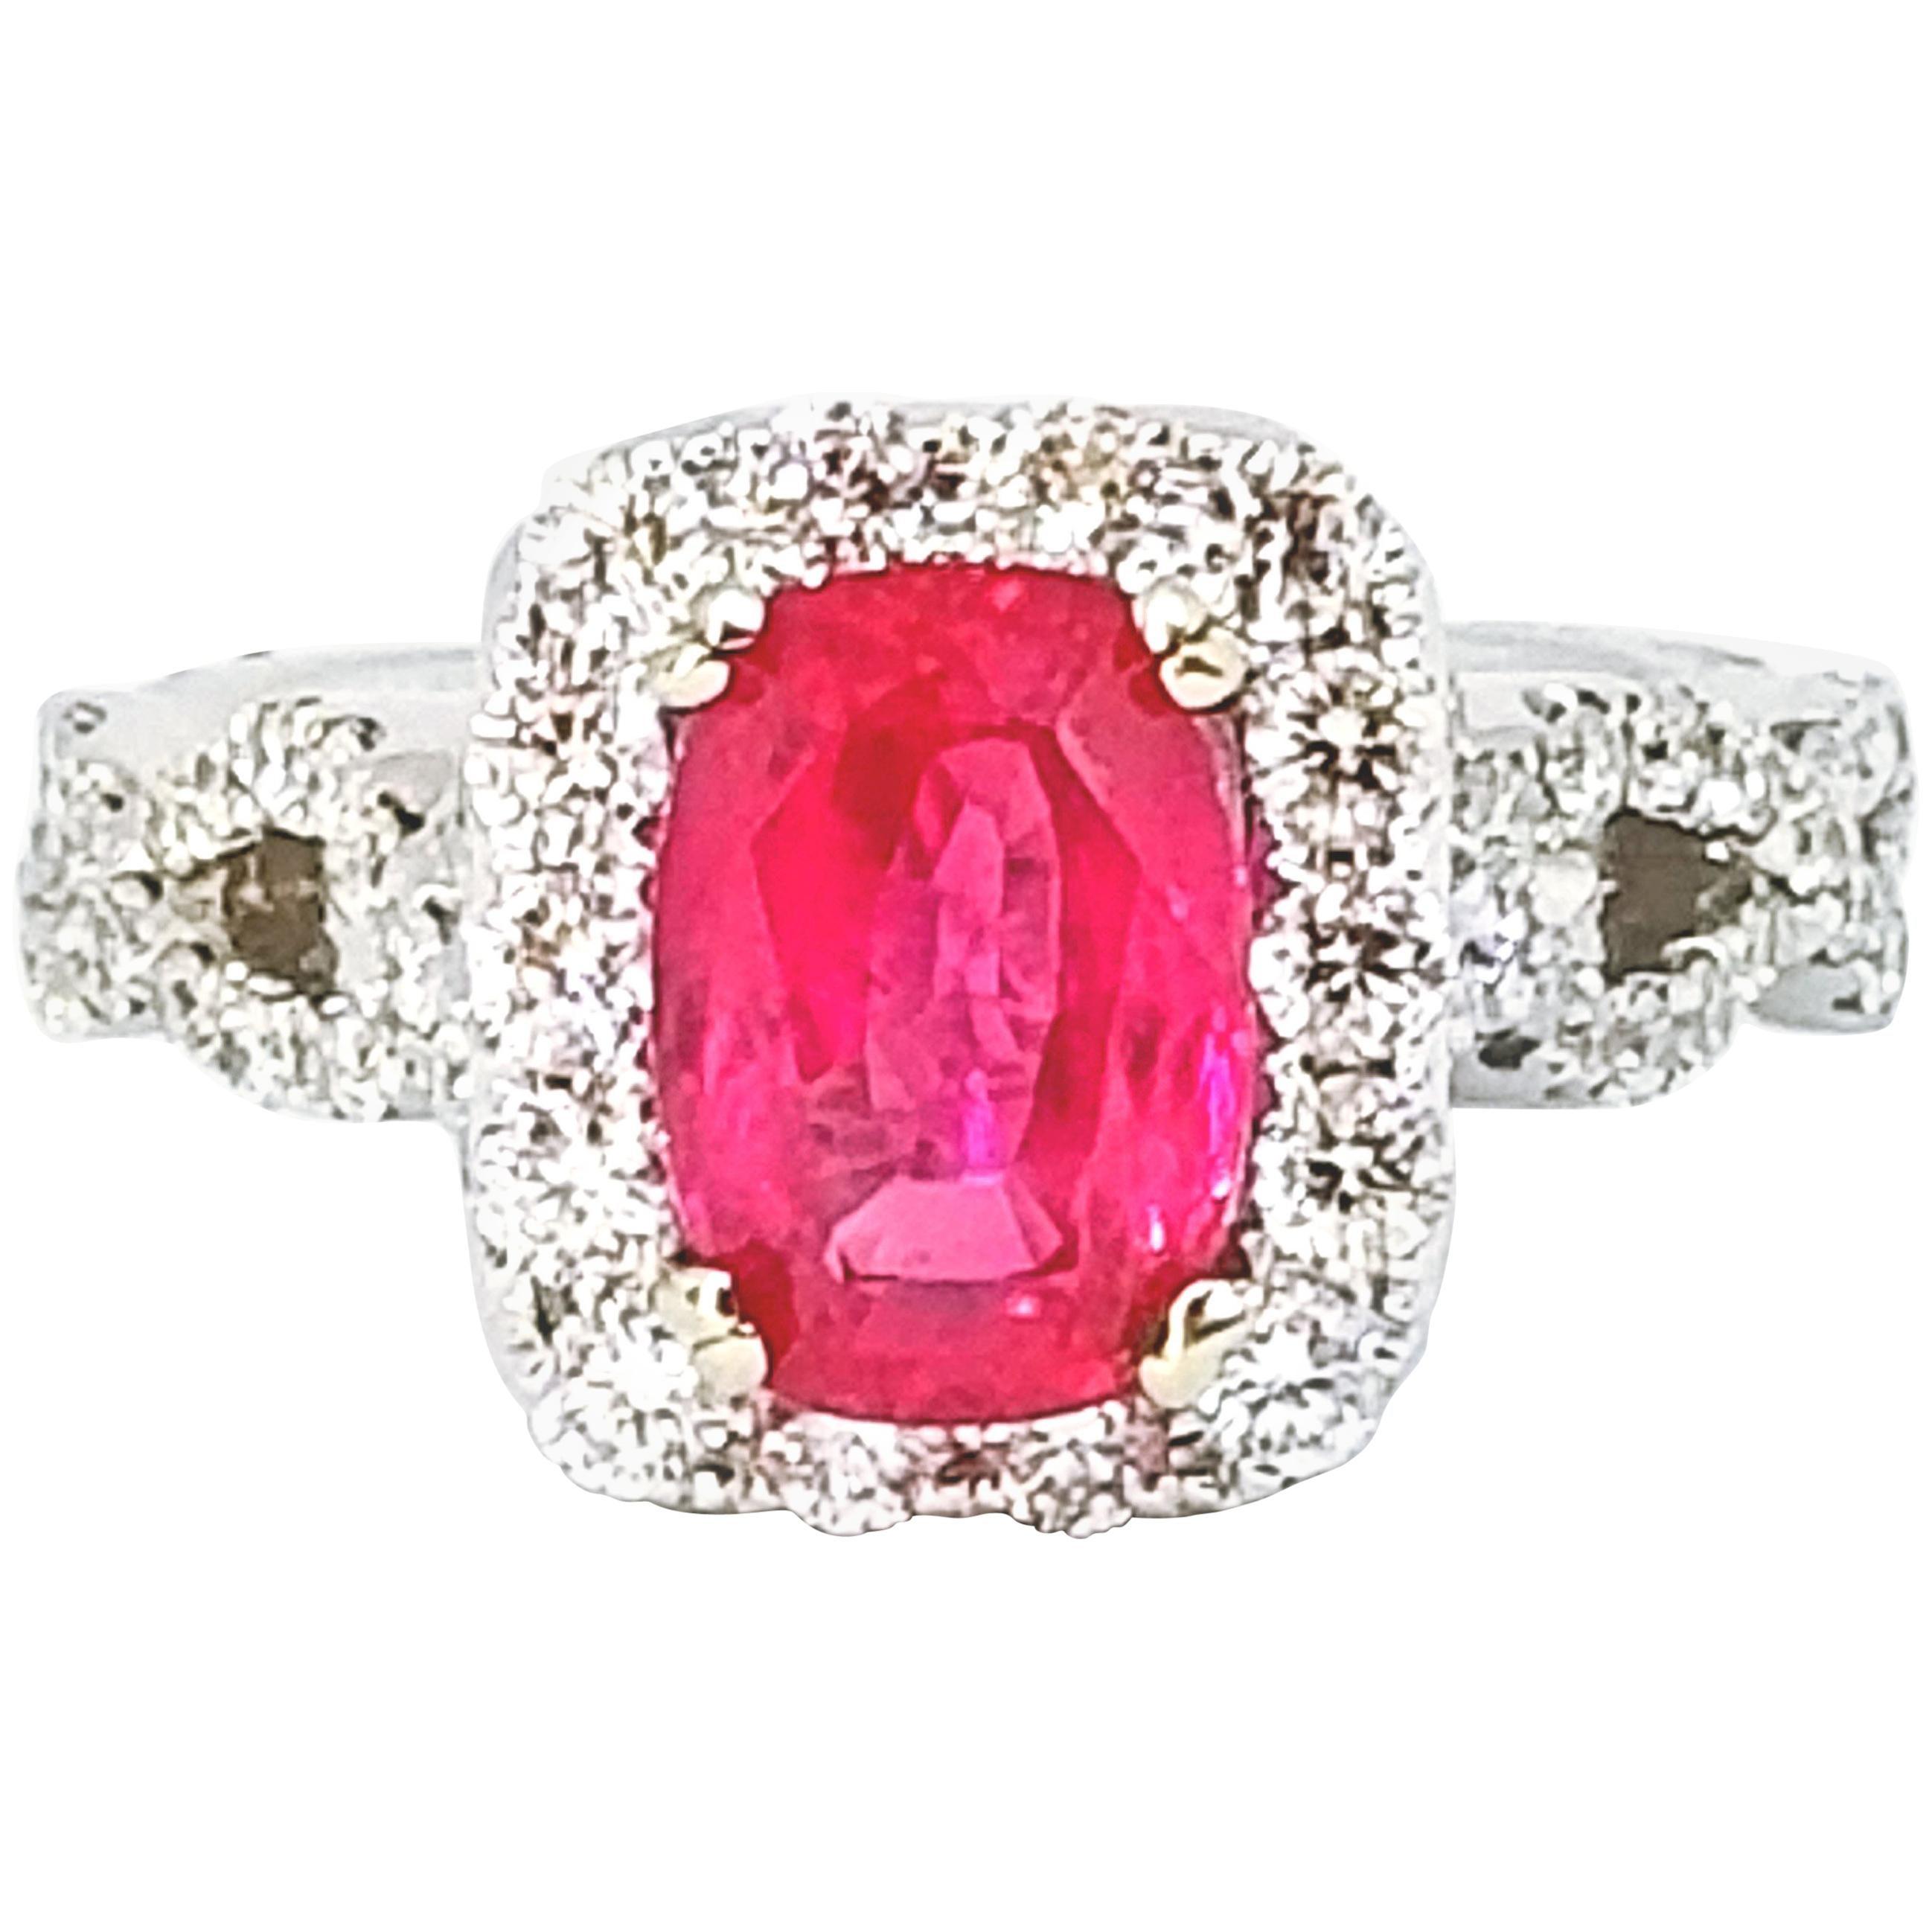 Edwardian Cut Intense Pink 2.19 Carat Sapphire Diamond Halo Ring White Gold